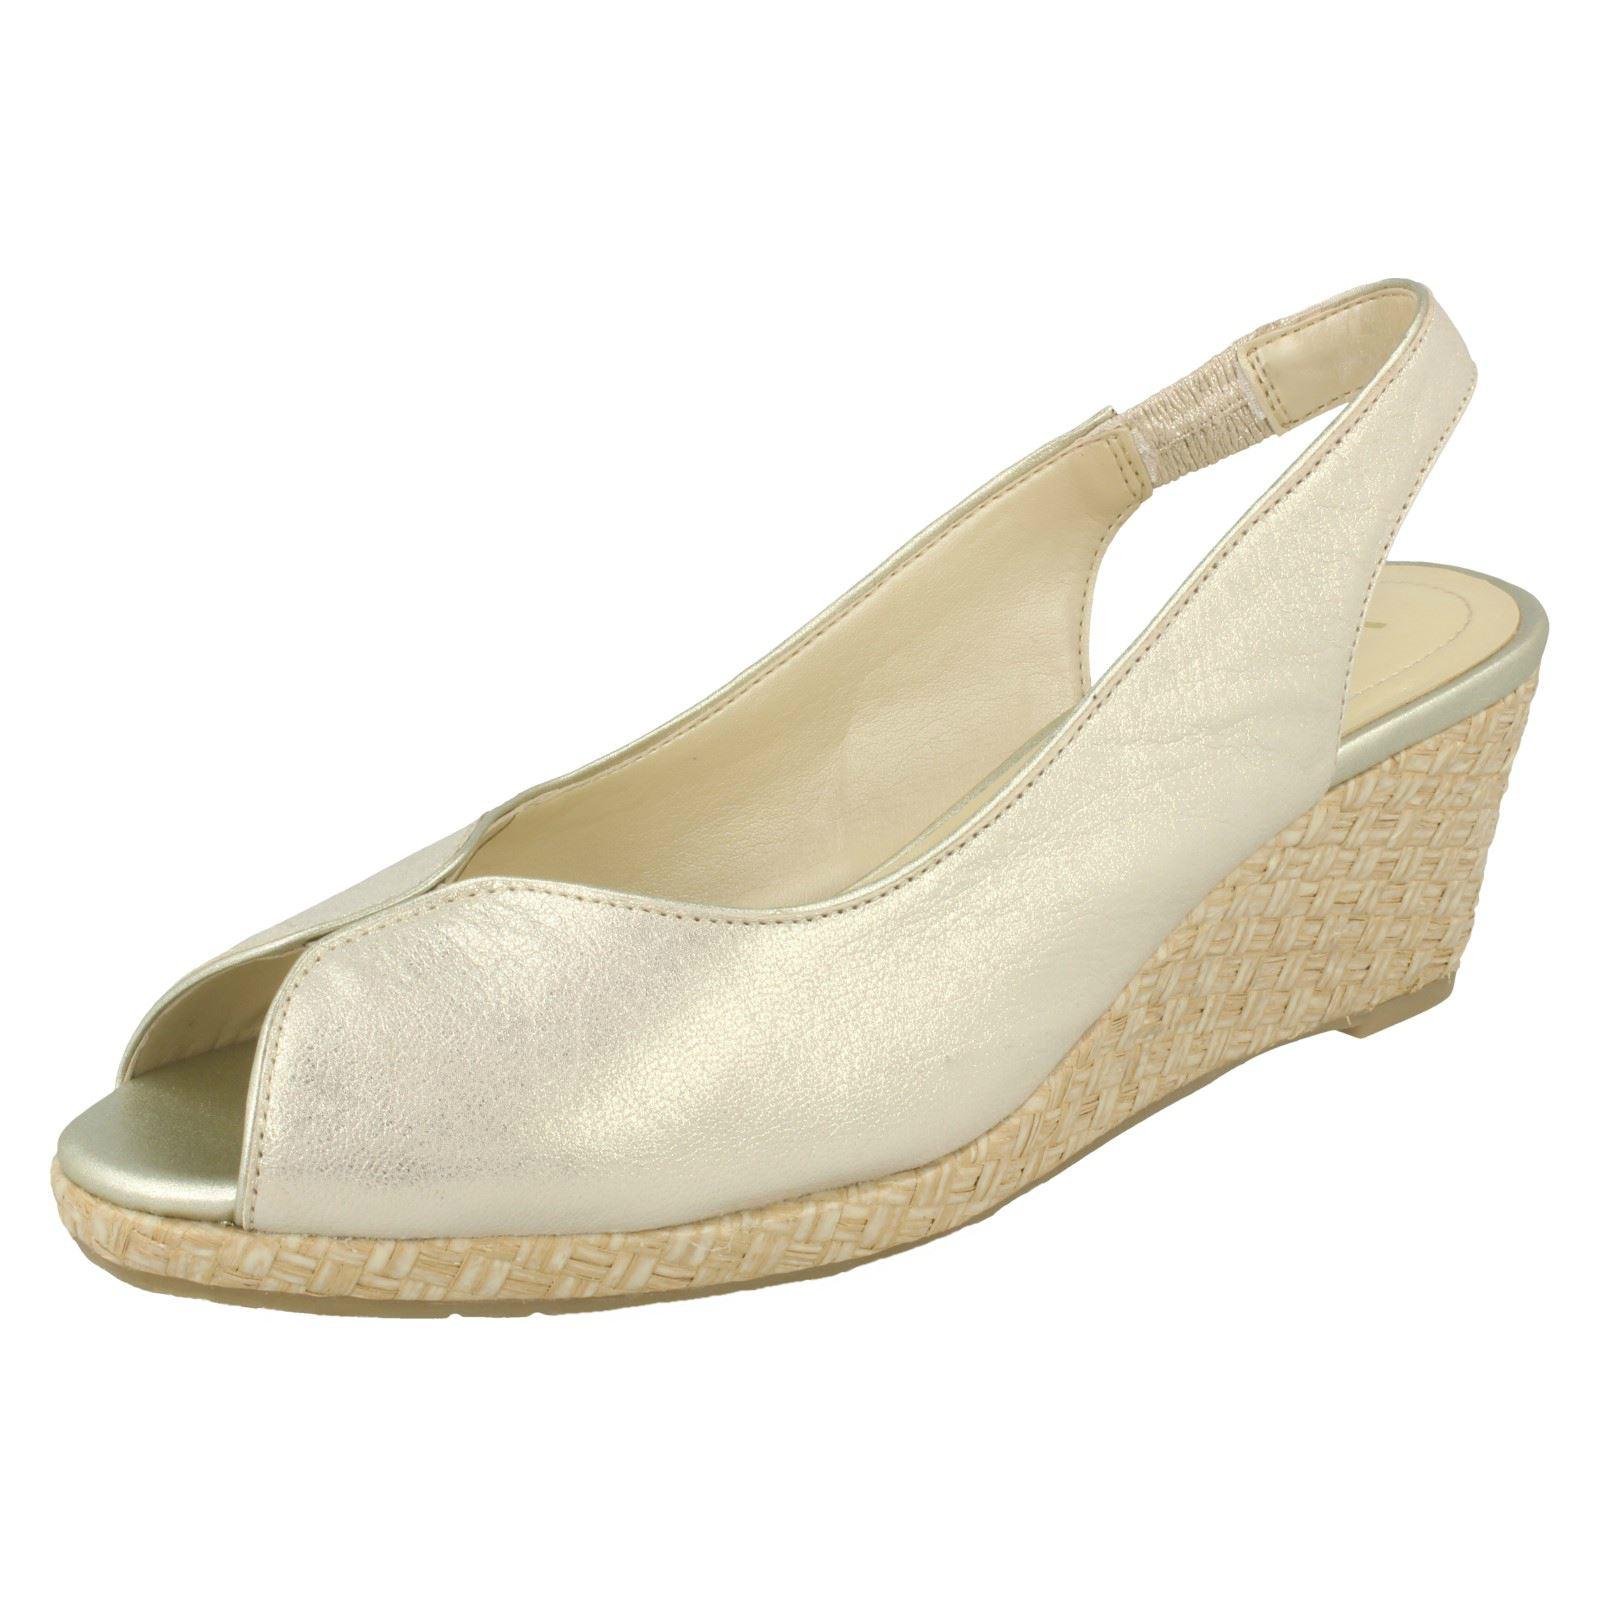 Damen Van Dal Leder Keil Sandale mit Gewebtes Detail - Avalon